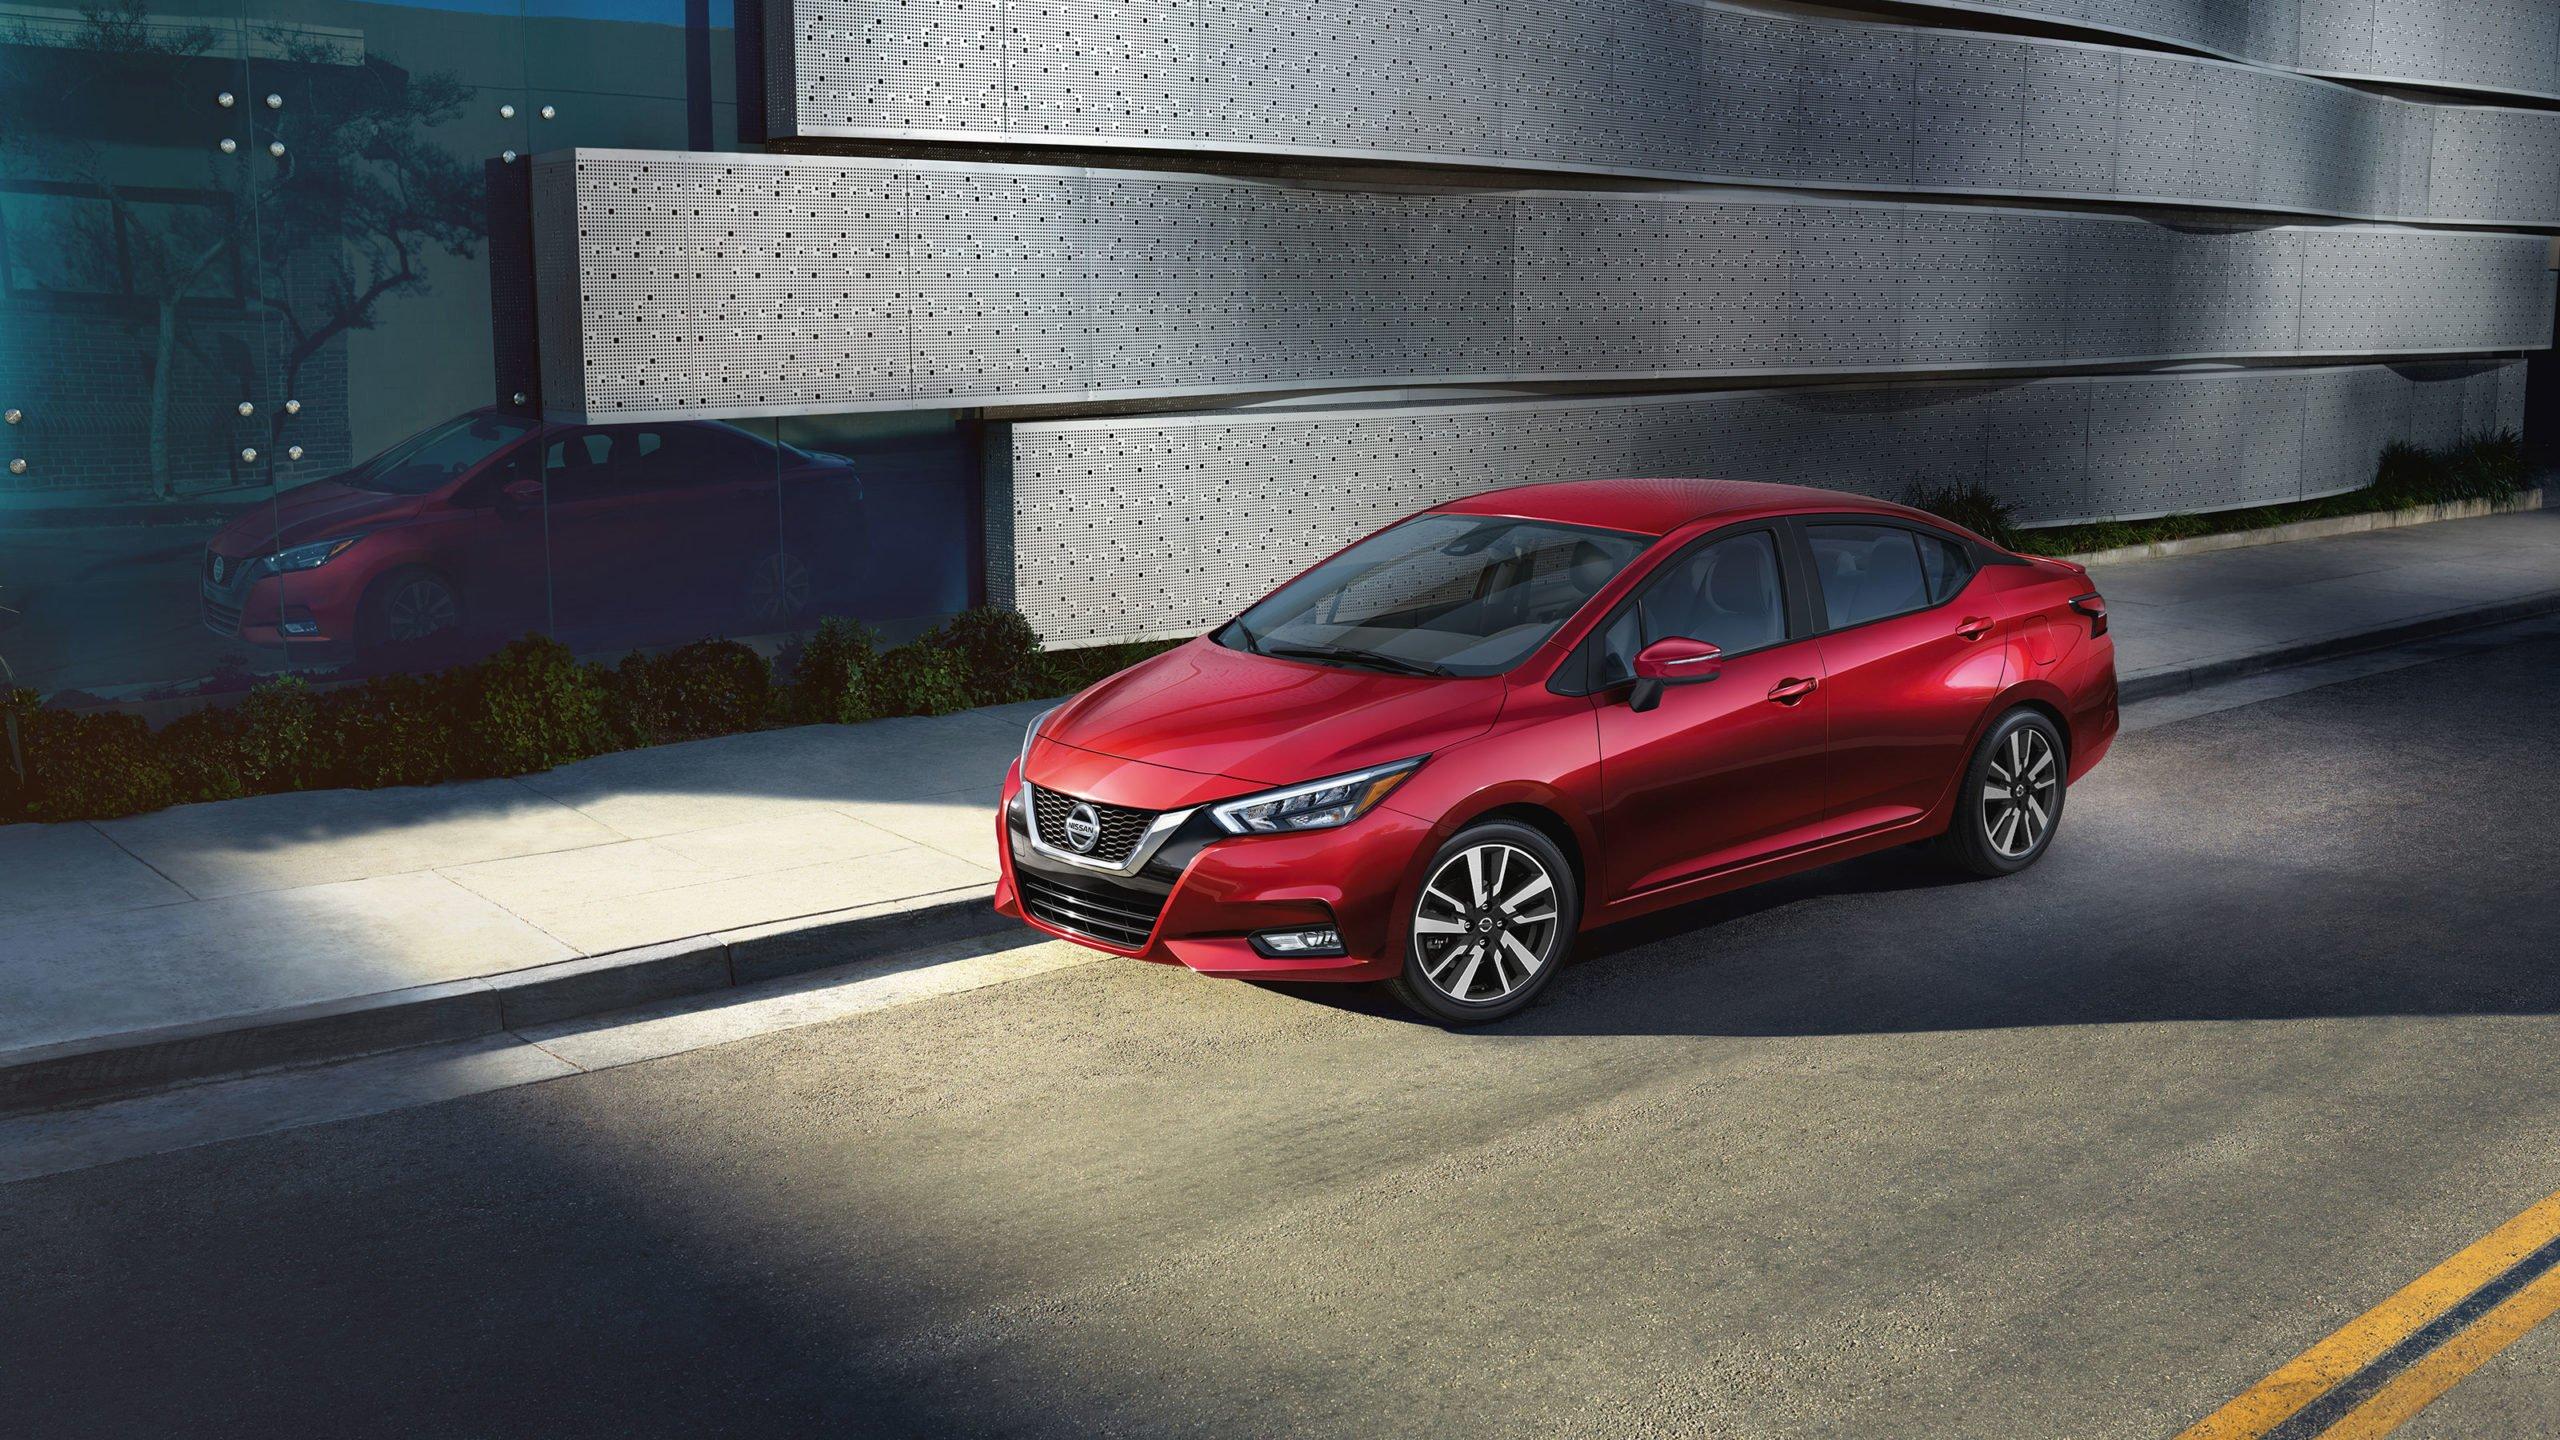 2020 Nissan Sunny UAE